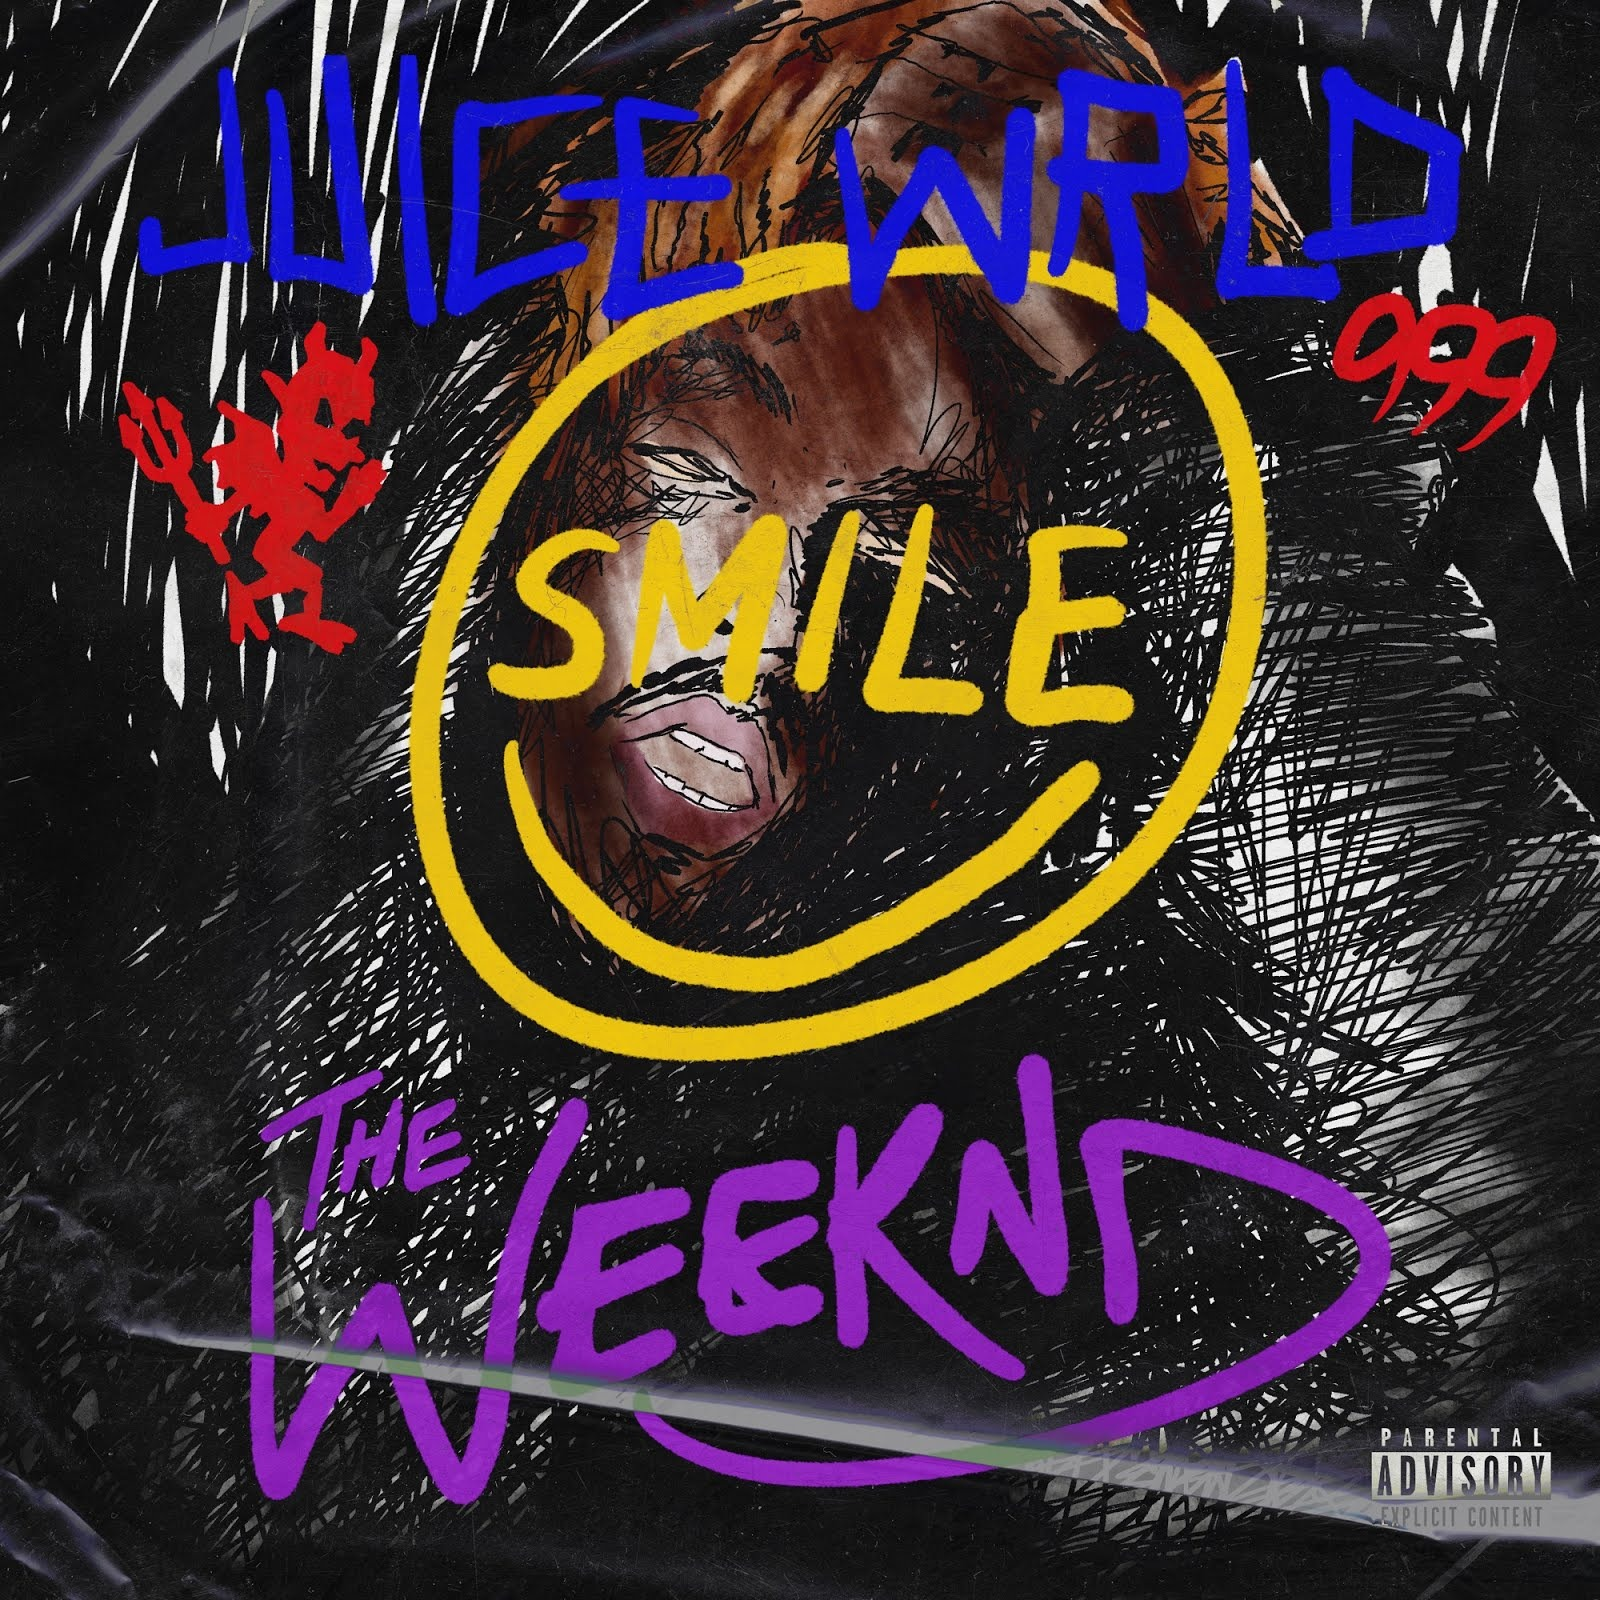 Juice WRLD & The Weeknd - Smile